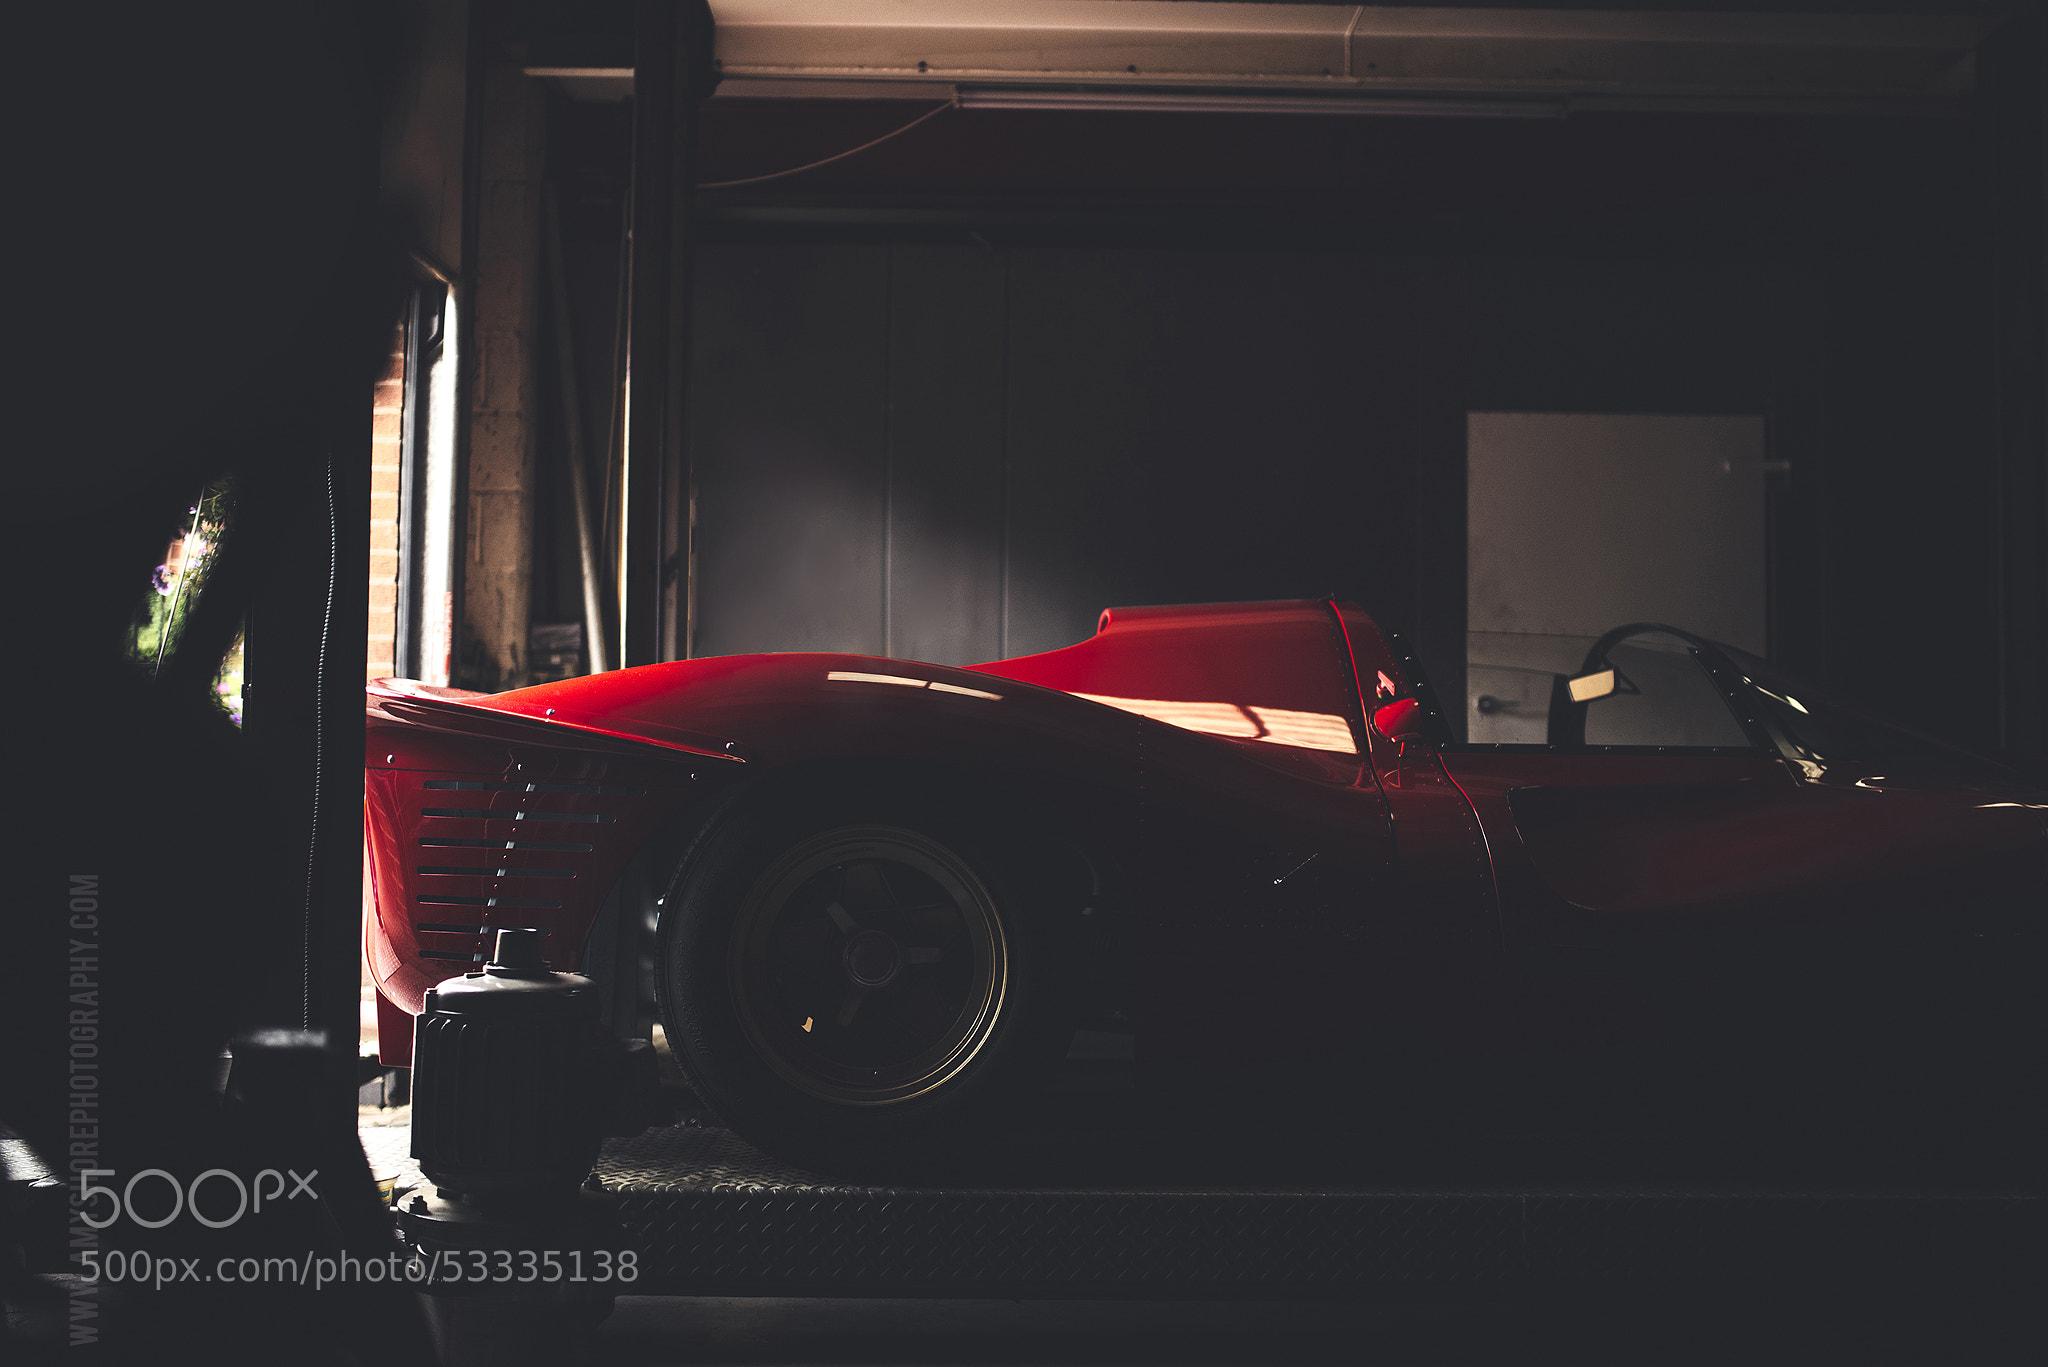 Photograph Ferrari P4 by Amy Shore on 500px